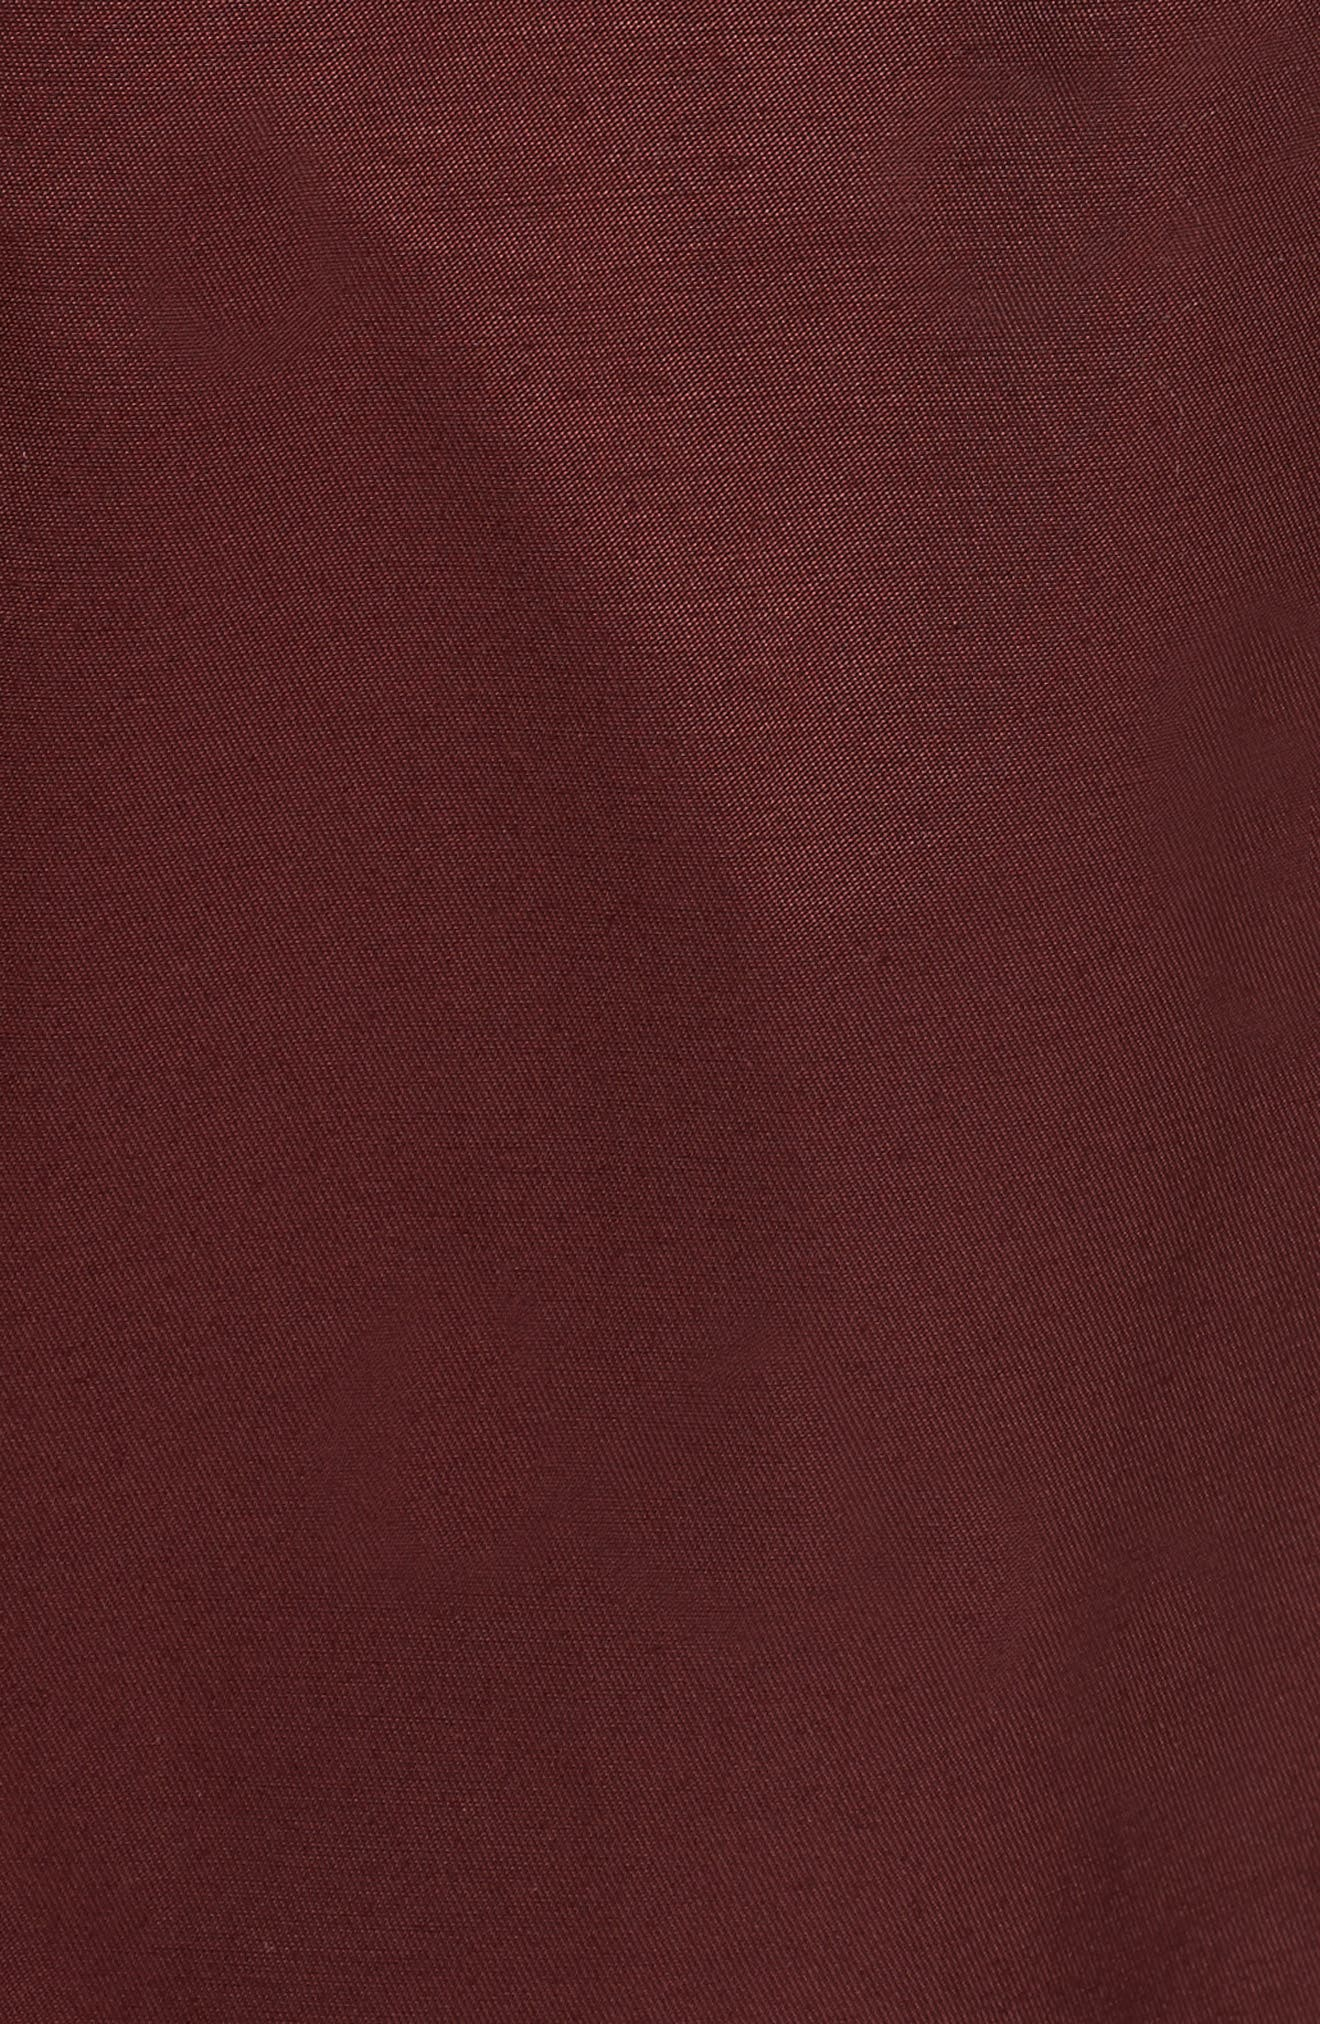 Parka with Detachable Bib Insert,                             Alternate thumbnail 18, color,